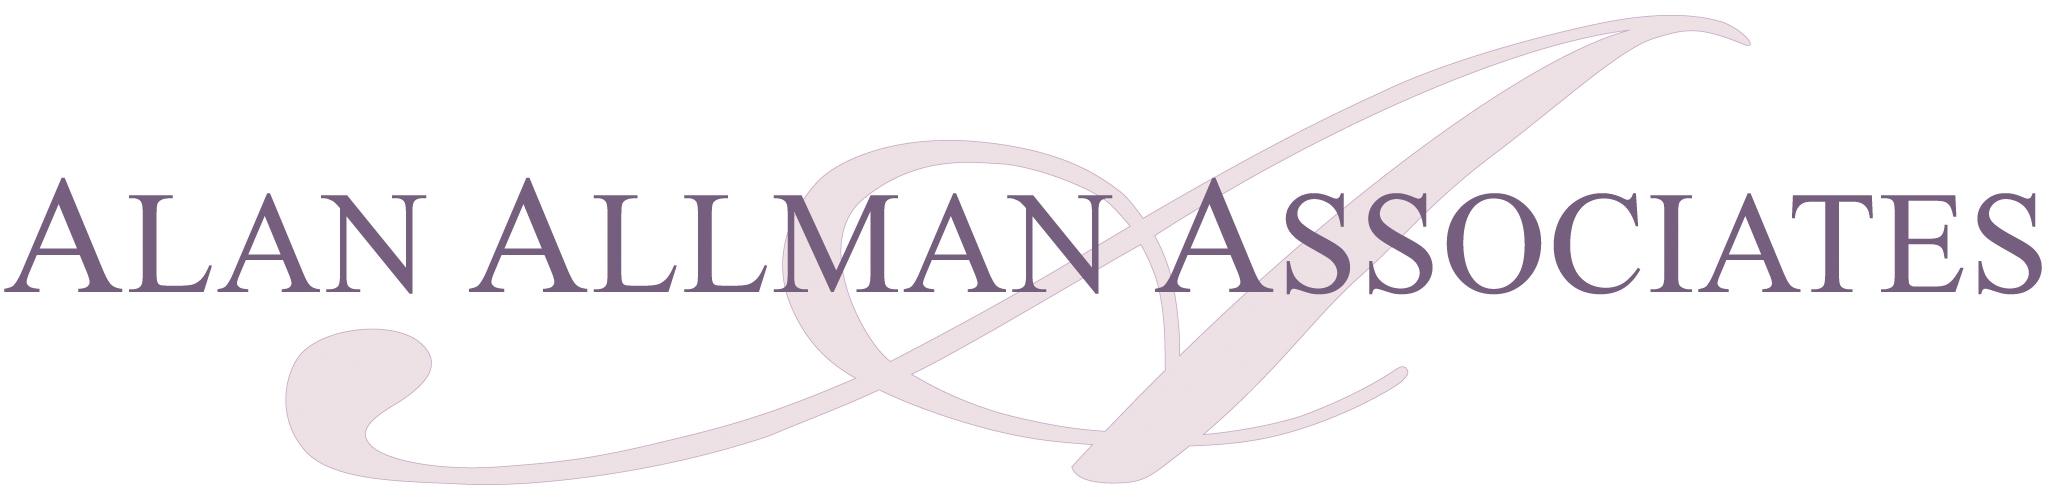 Alan Allman Associates